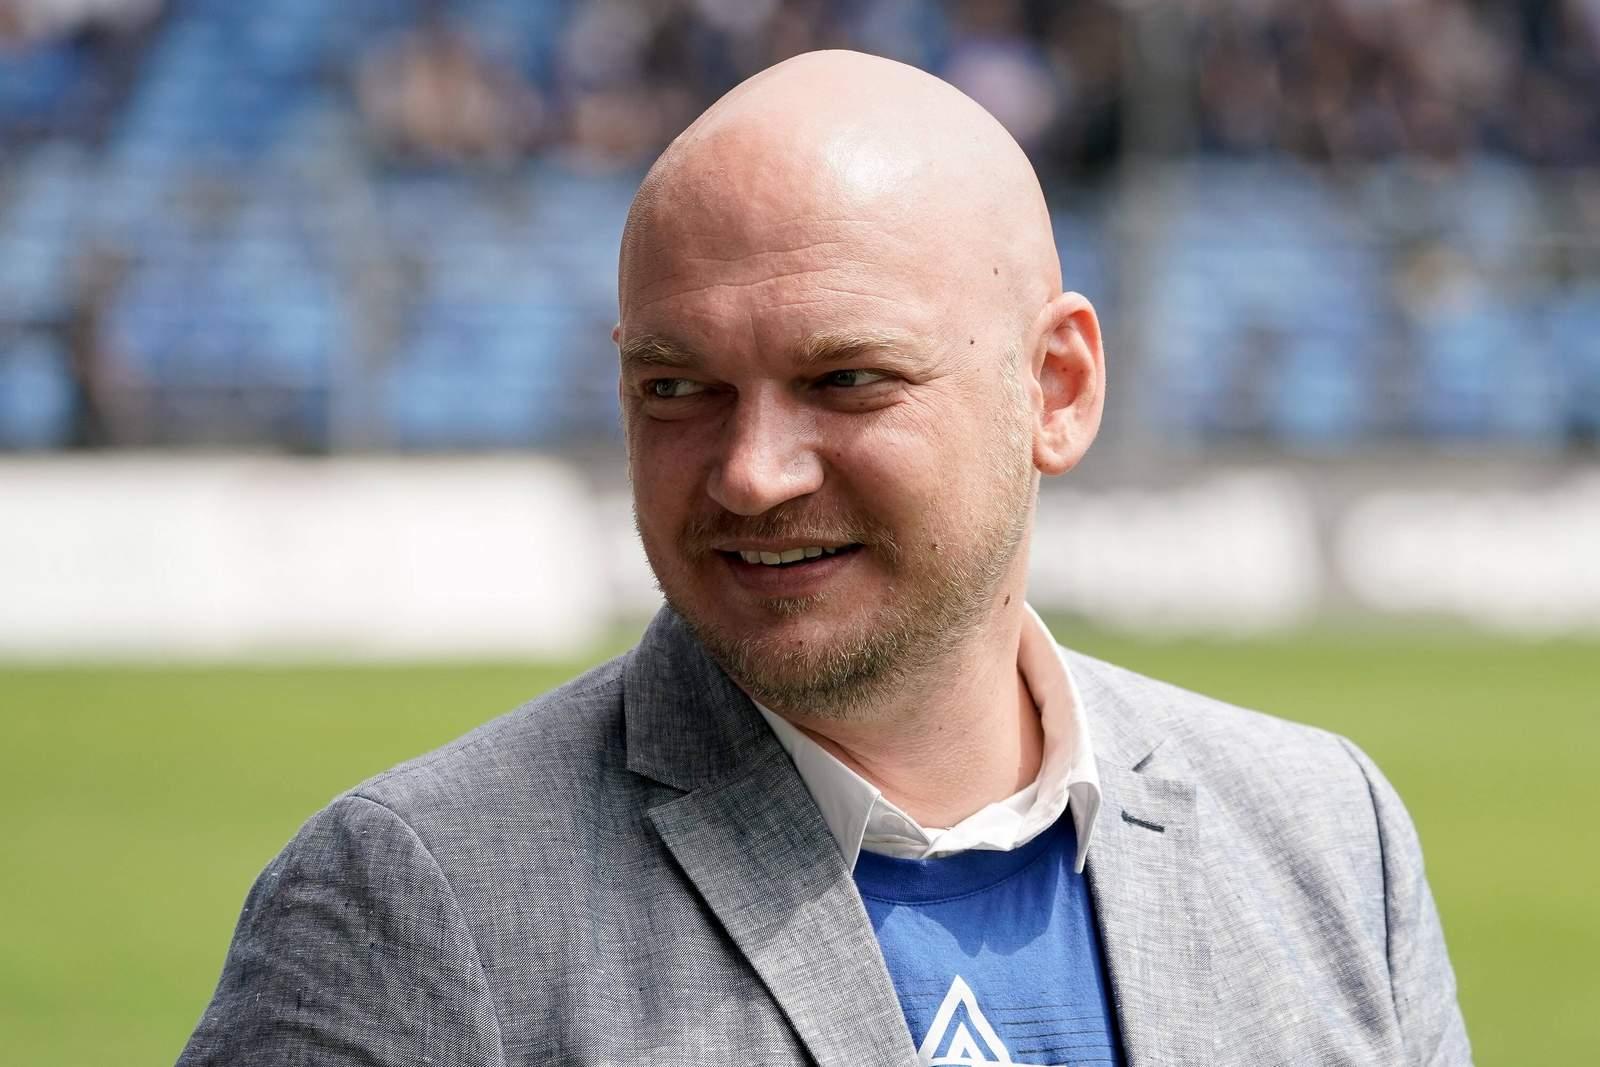 Markus Kompp ist Geschäftsführer bei Waldhof Mannheim